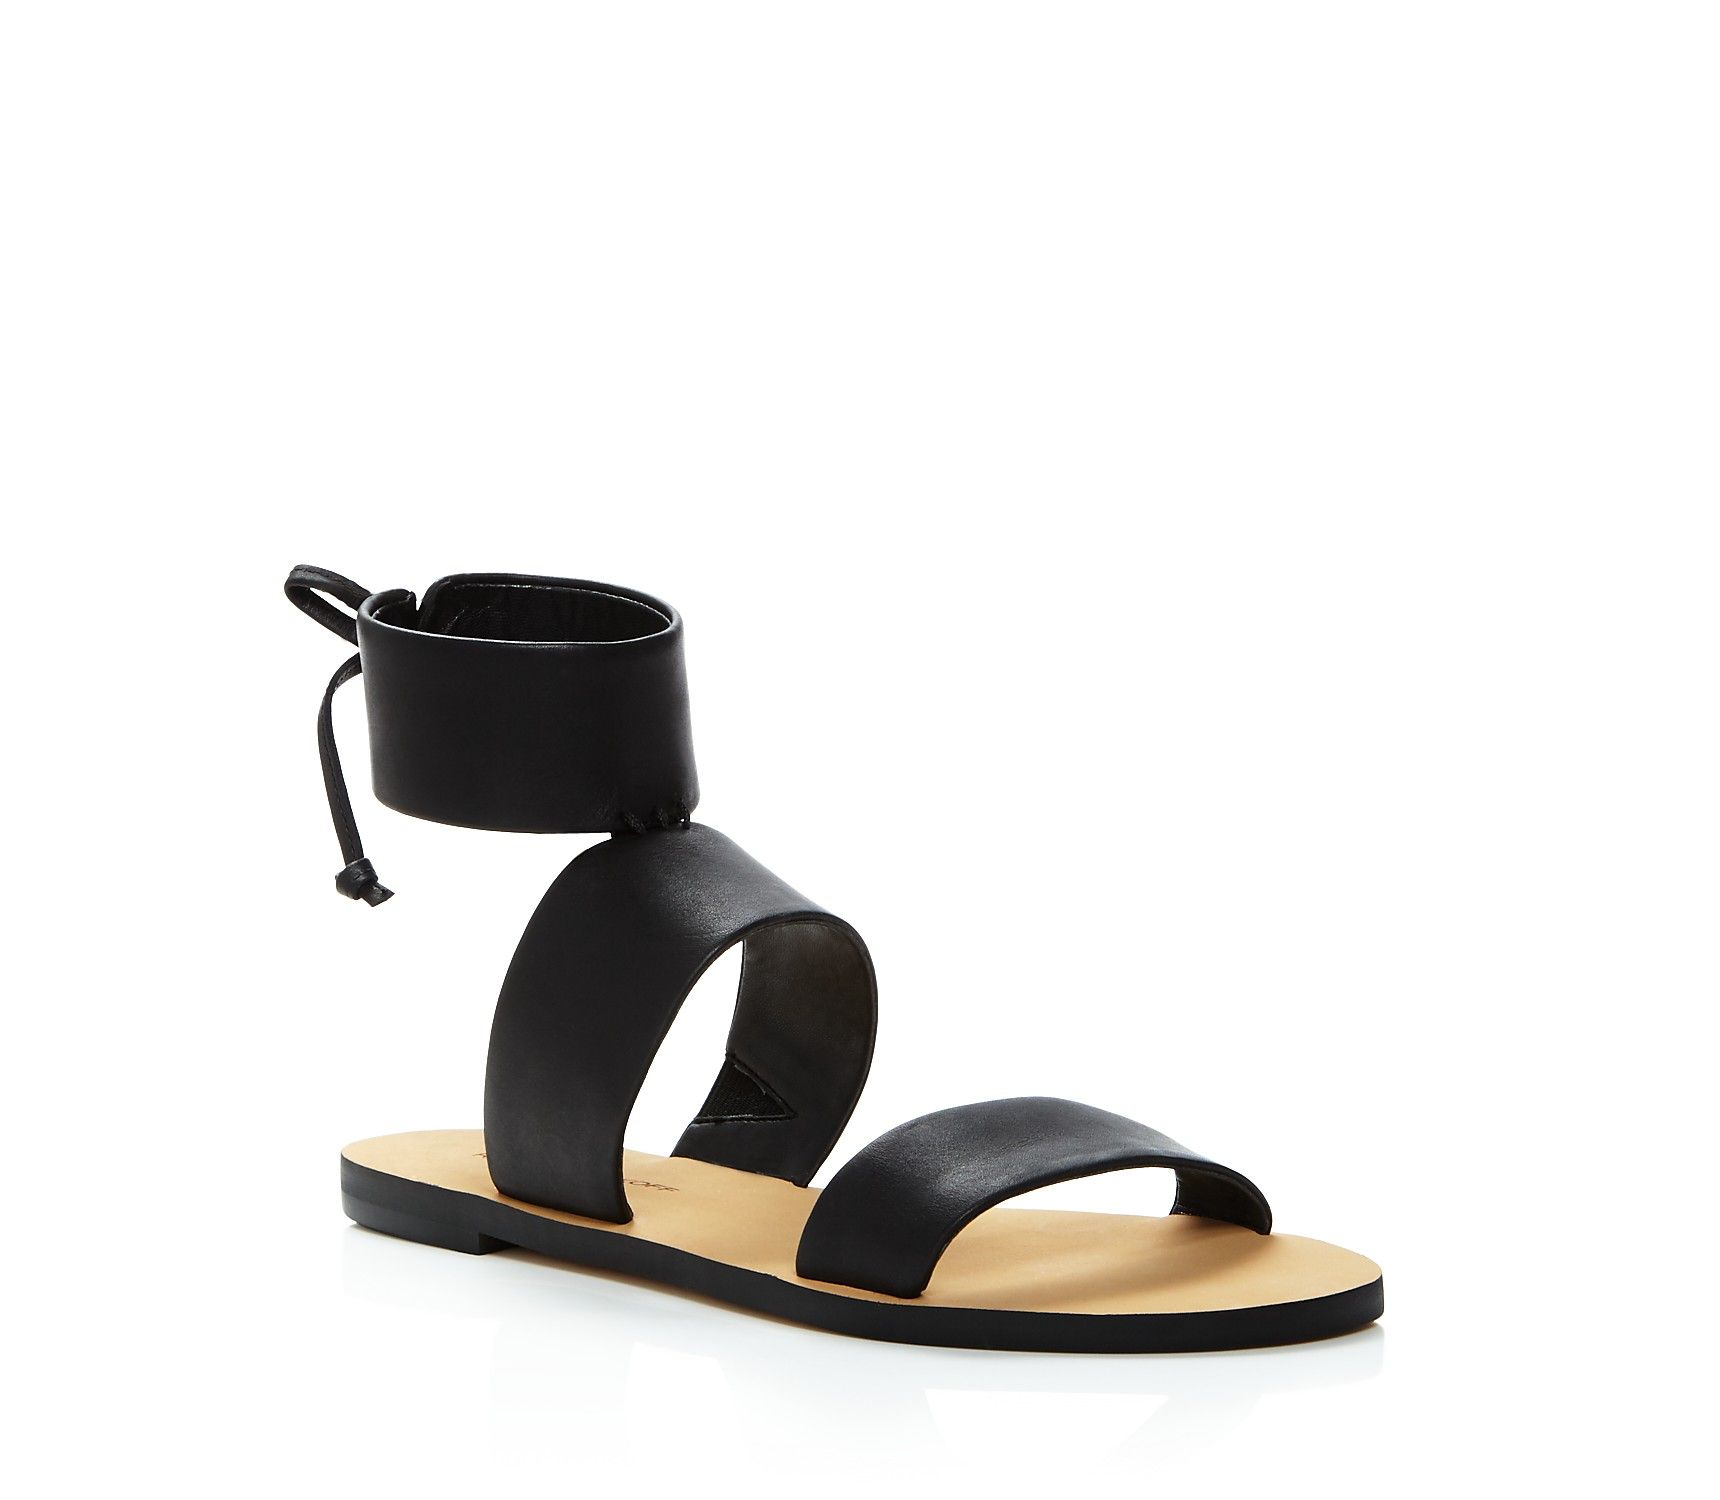 Rebecca Minkoff Leather Ankle Strap Sandals largest supplier cheap online discount amazon 7etvI09APB